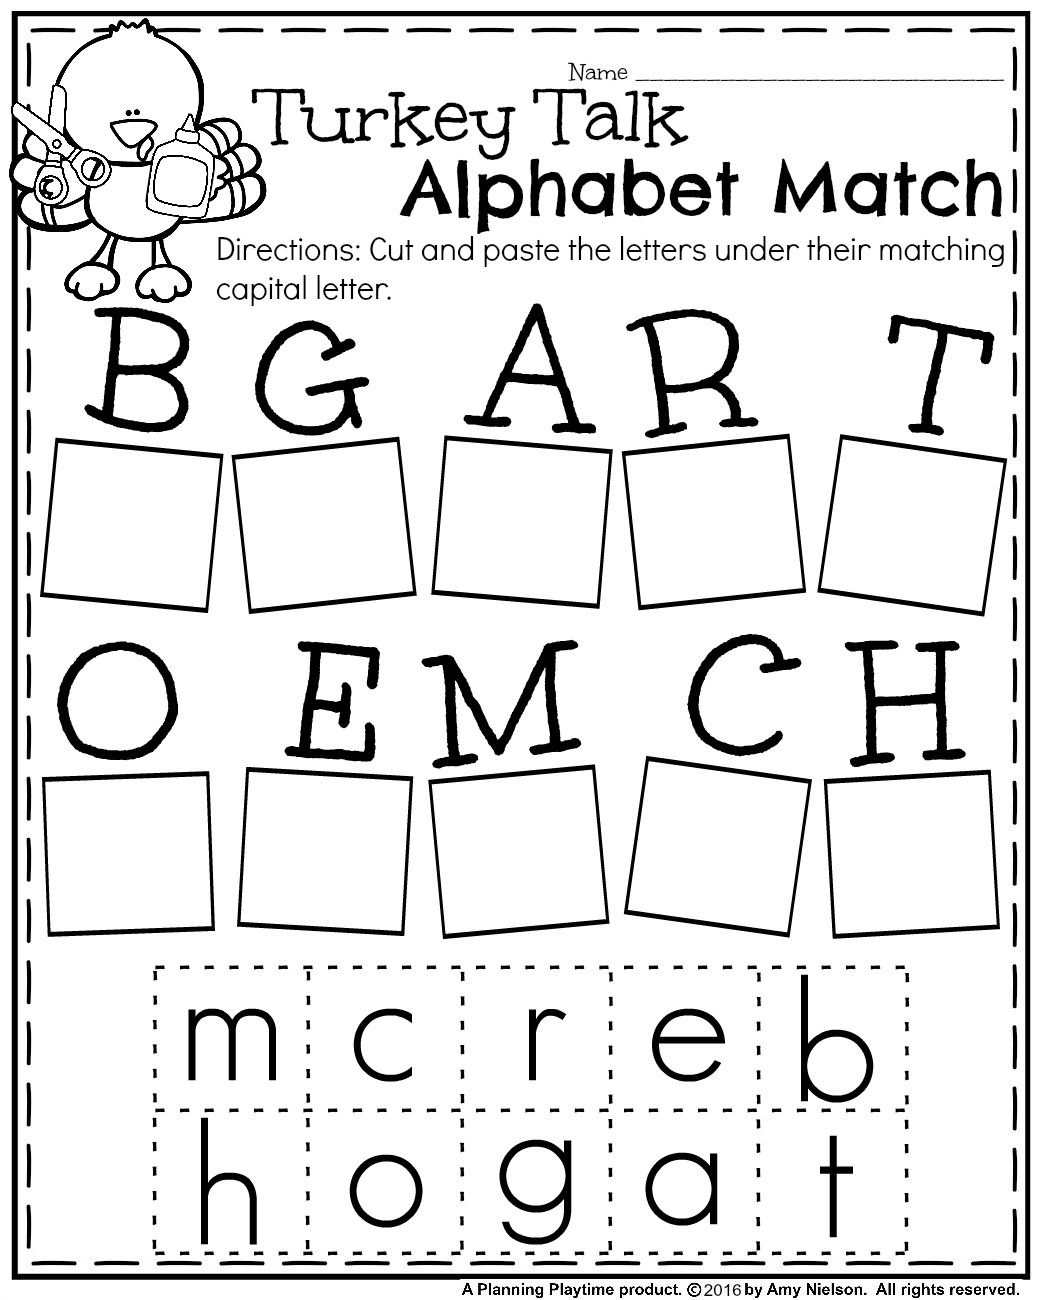 Fall Kindergarten Worksheets For November | Teachers Pay Teachers - Free Printable Kindergarten Worksheets Cut And Paste